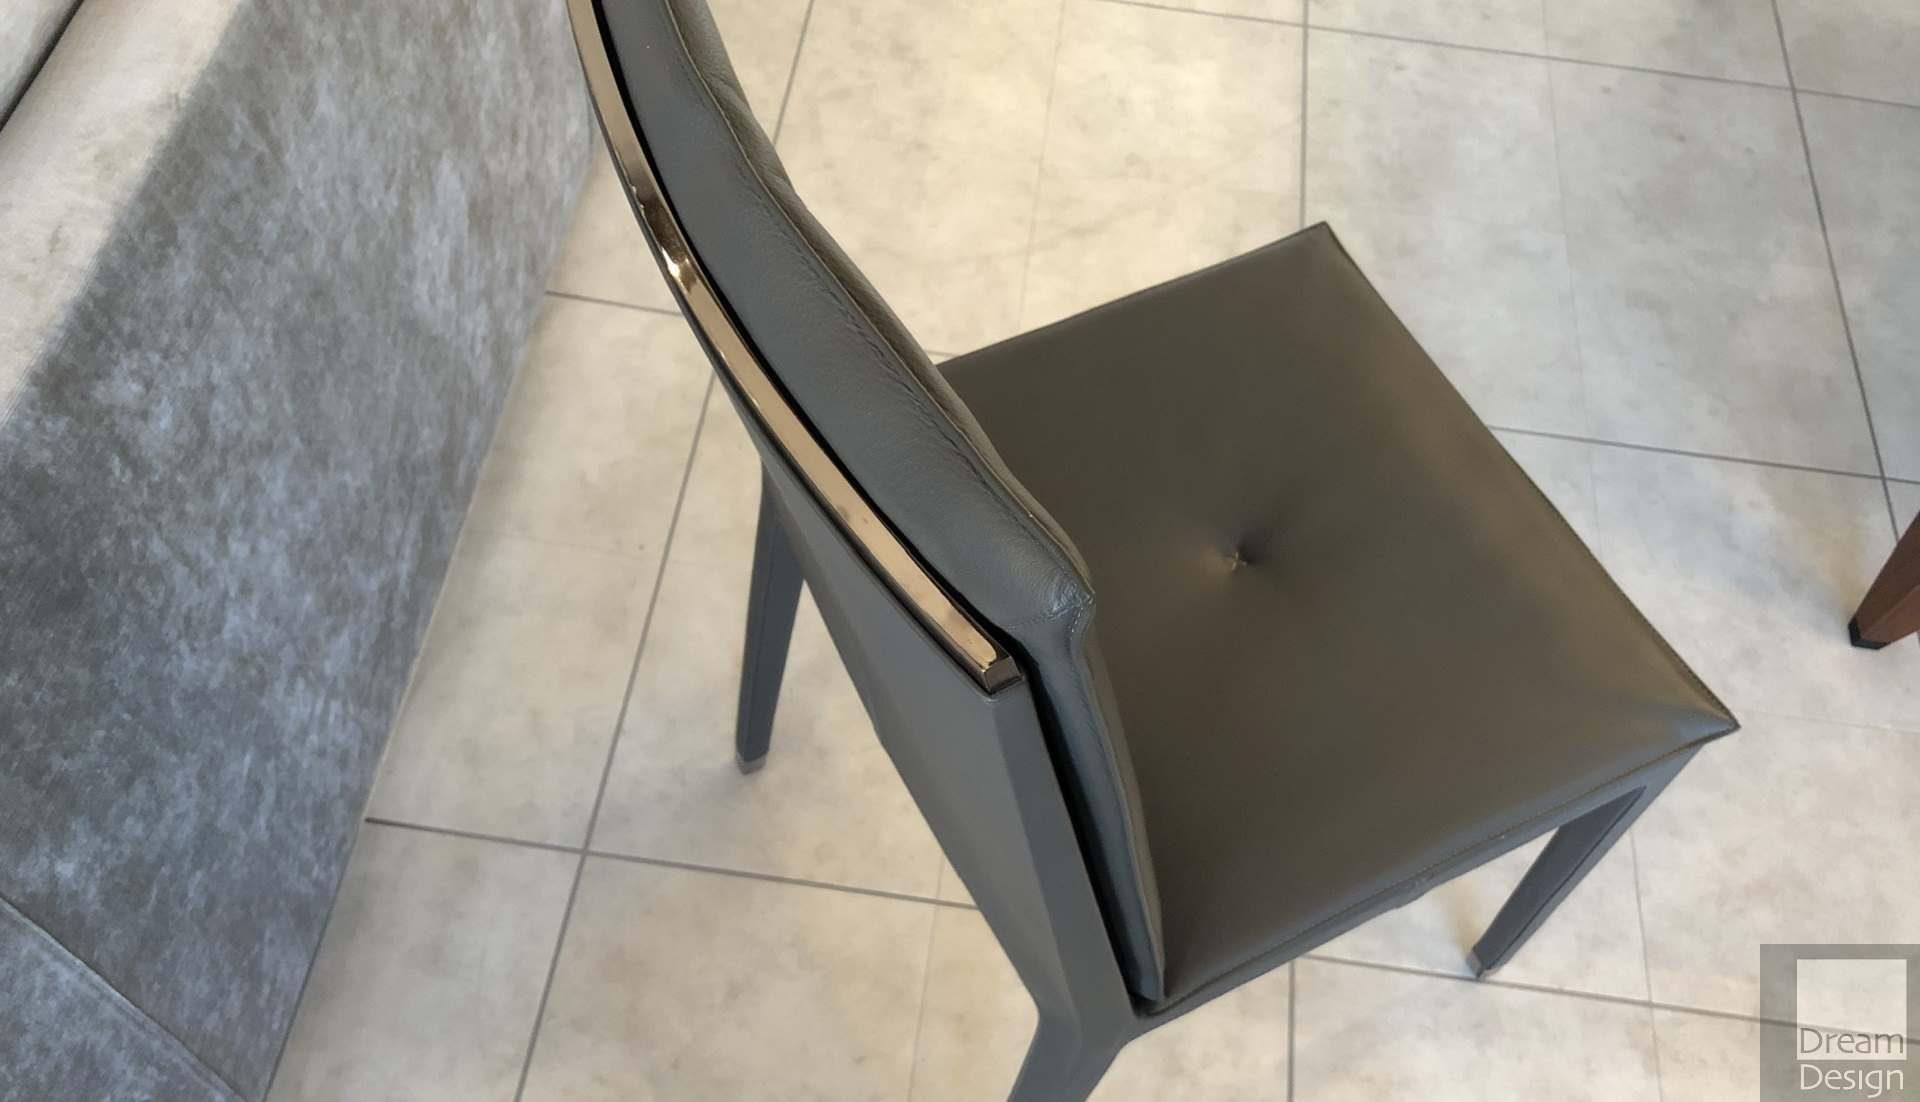 Poltrona Frau Fitzgerald Chair Ex-Display